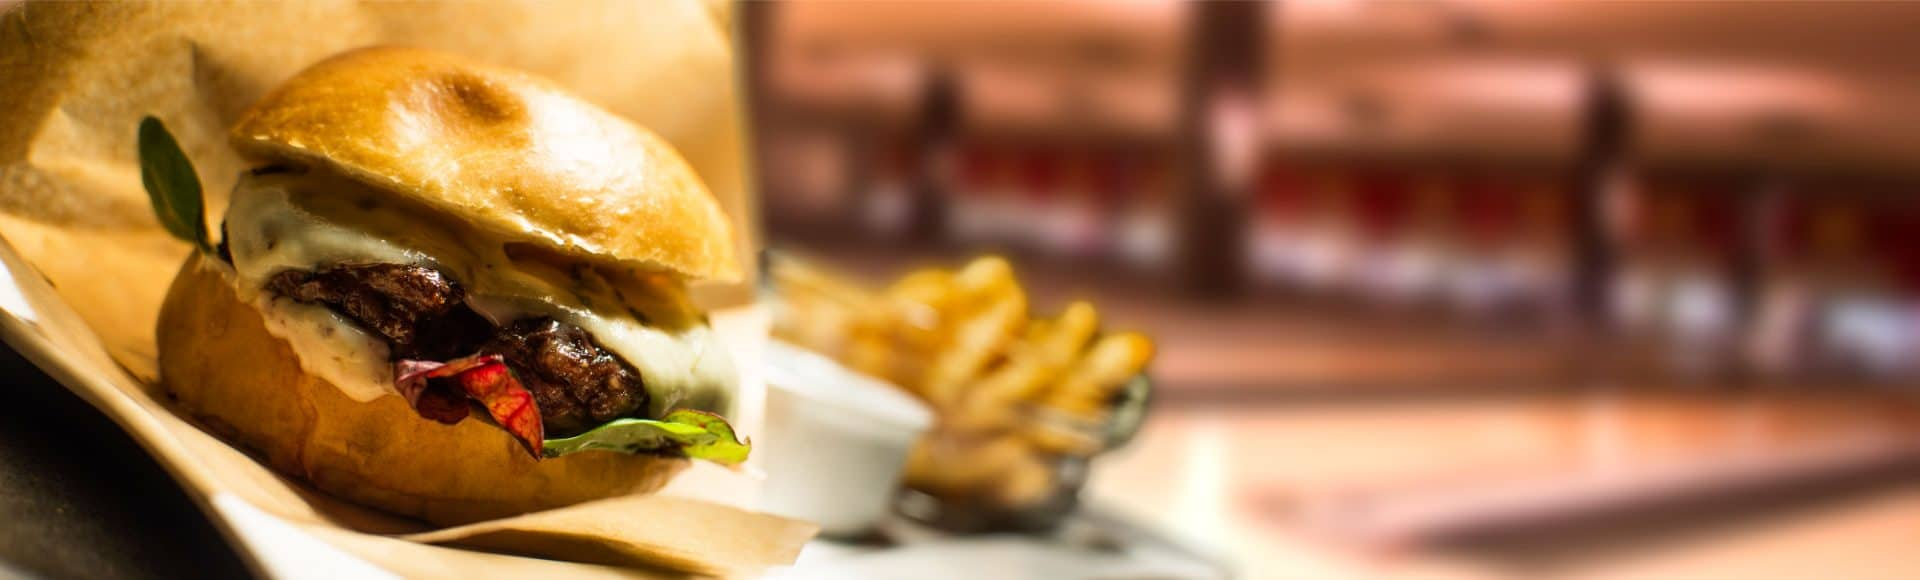 Bowl 'n' burger paketerbjudande - hamburgare i Stockholm